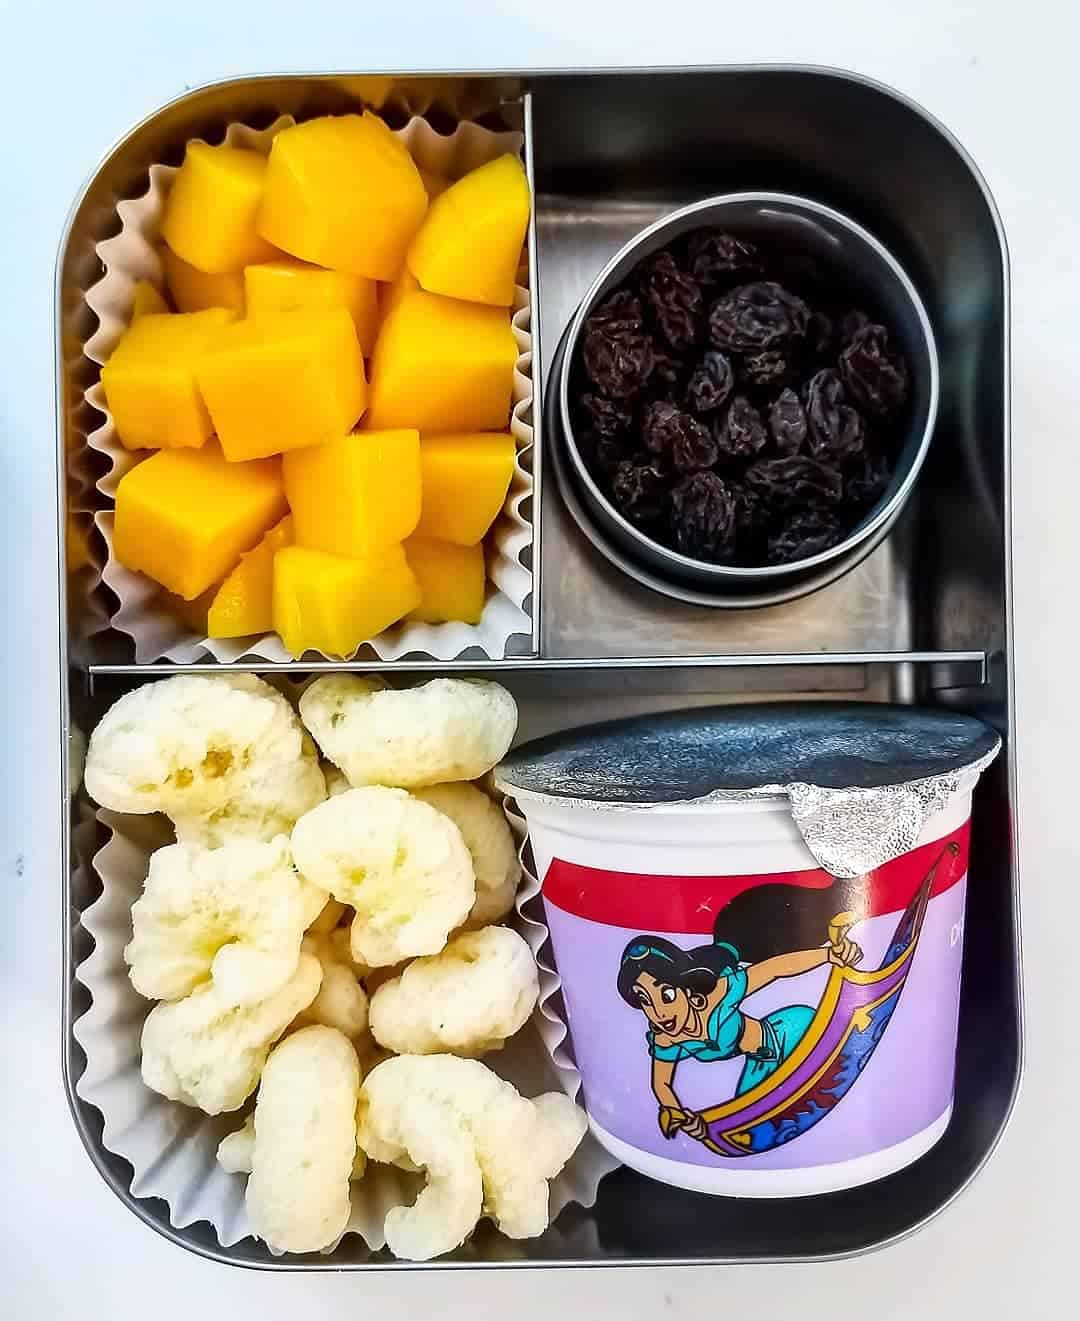 Yogurt, mango, cheese puffs